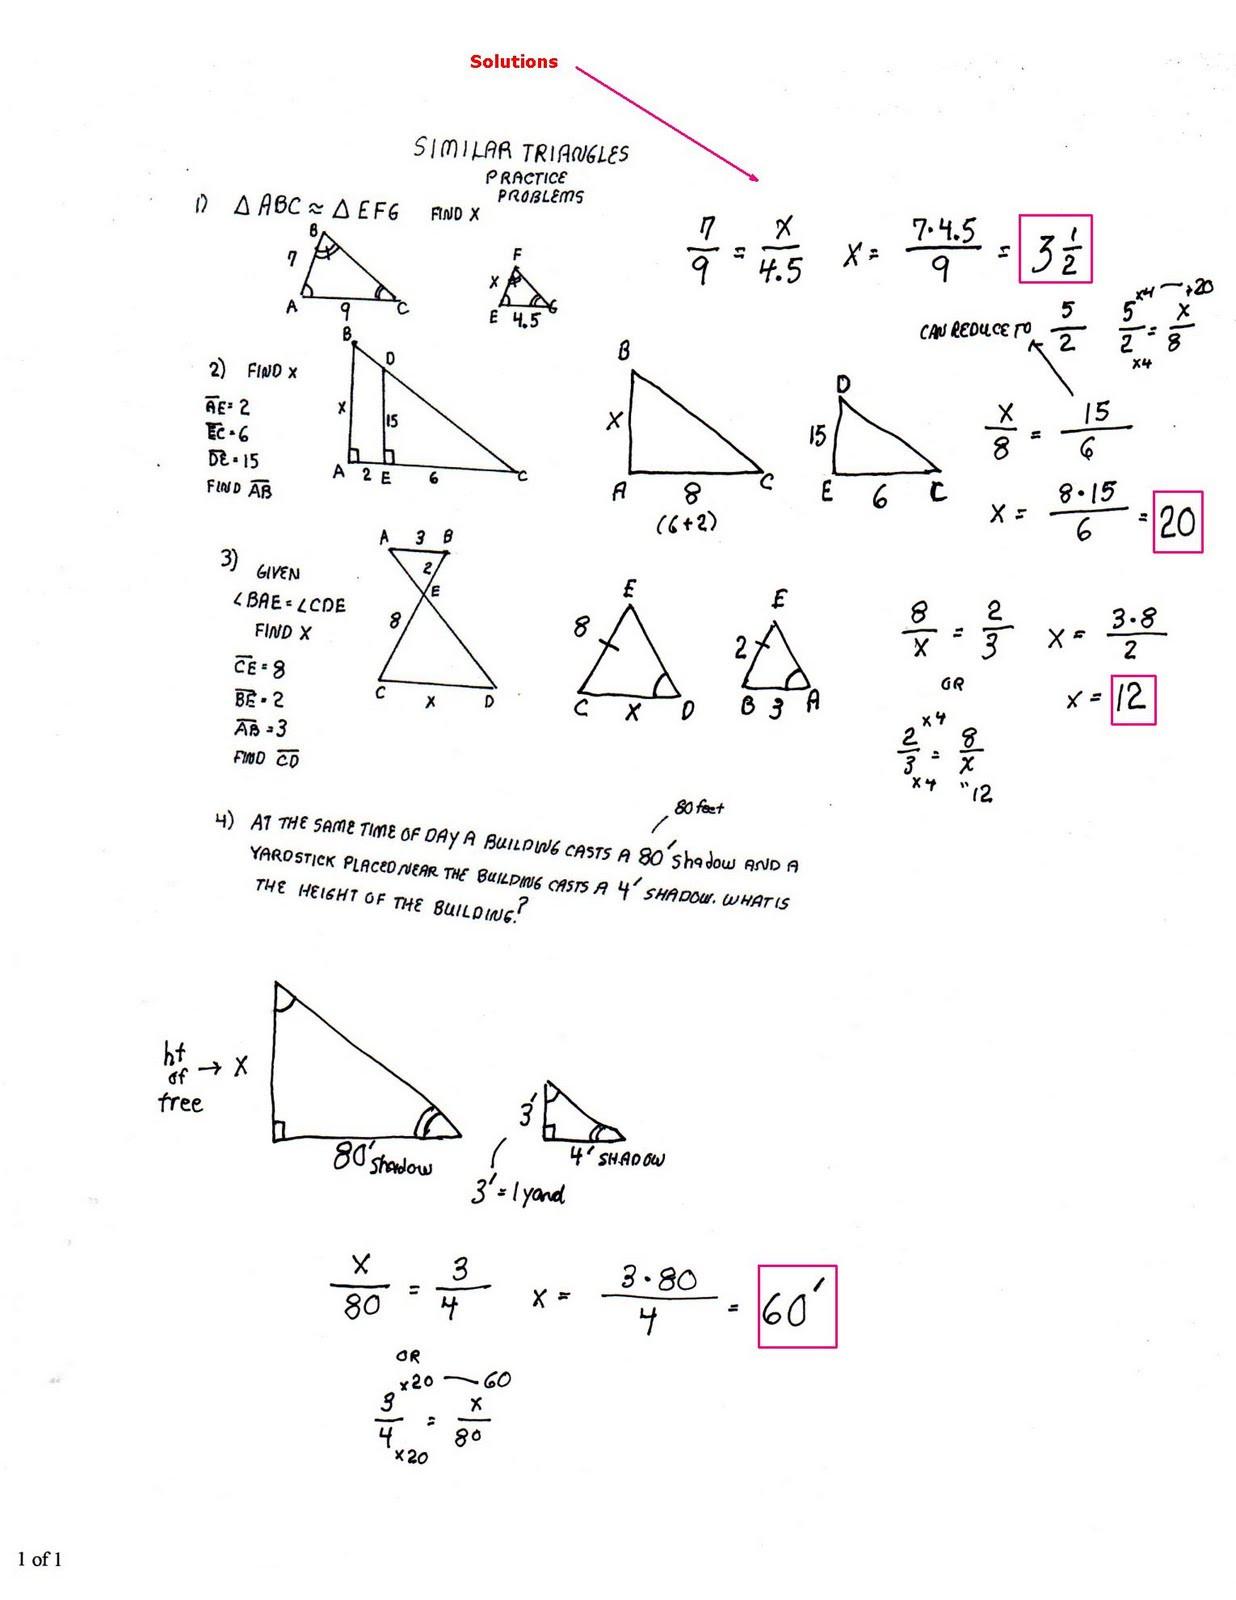 Proving Triangles Similar Worksheet Similar Triangles Worksheet Answers